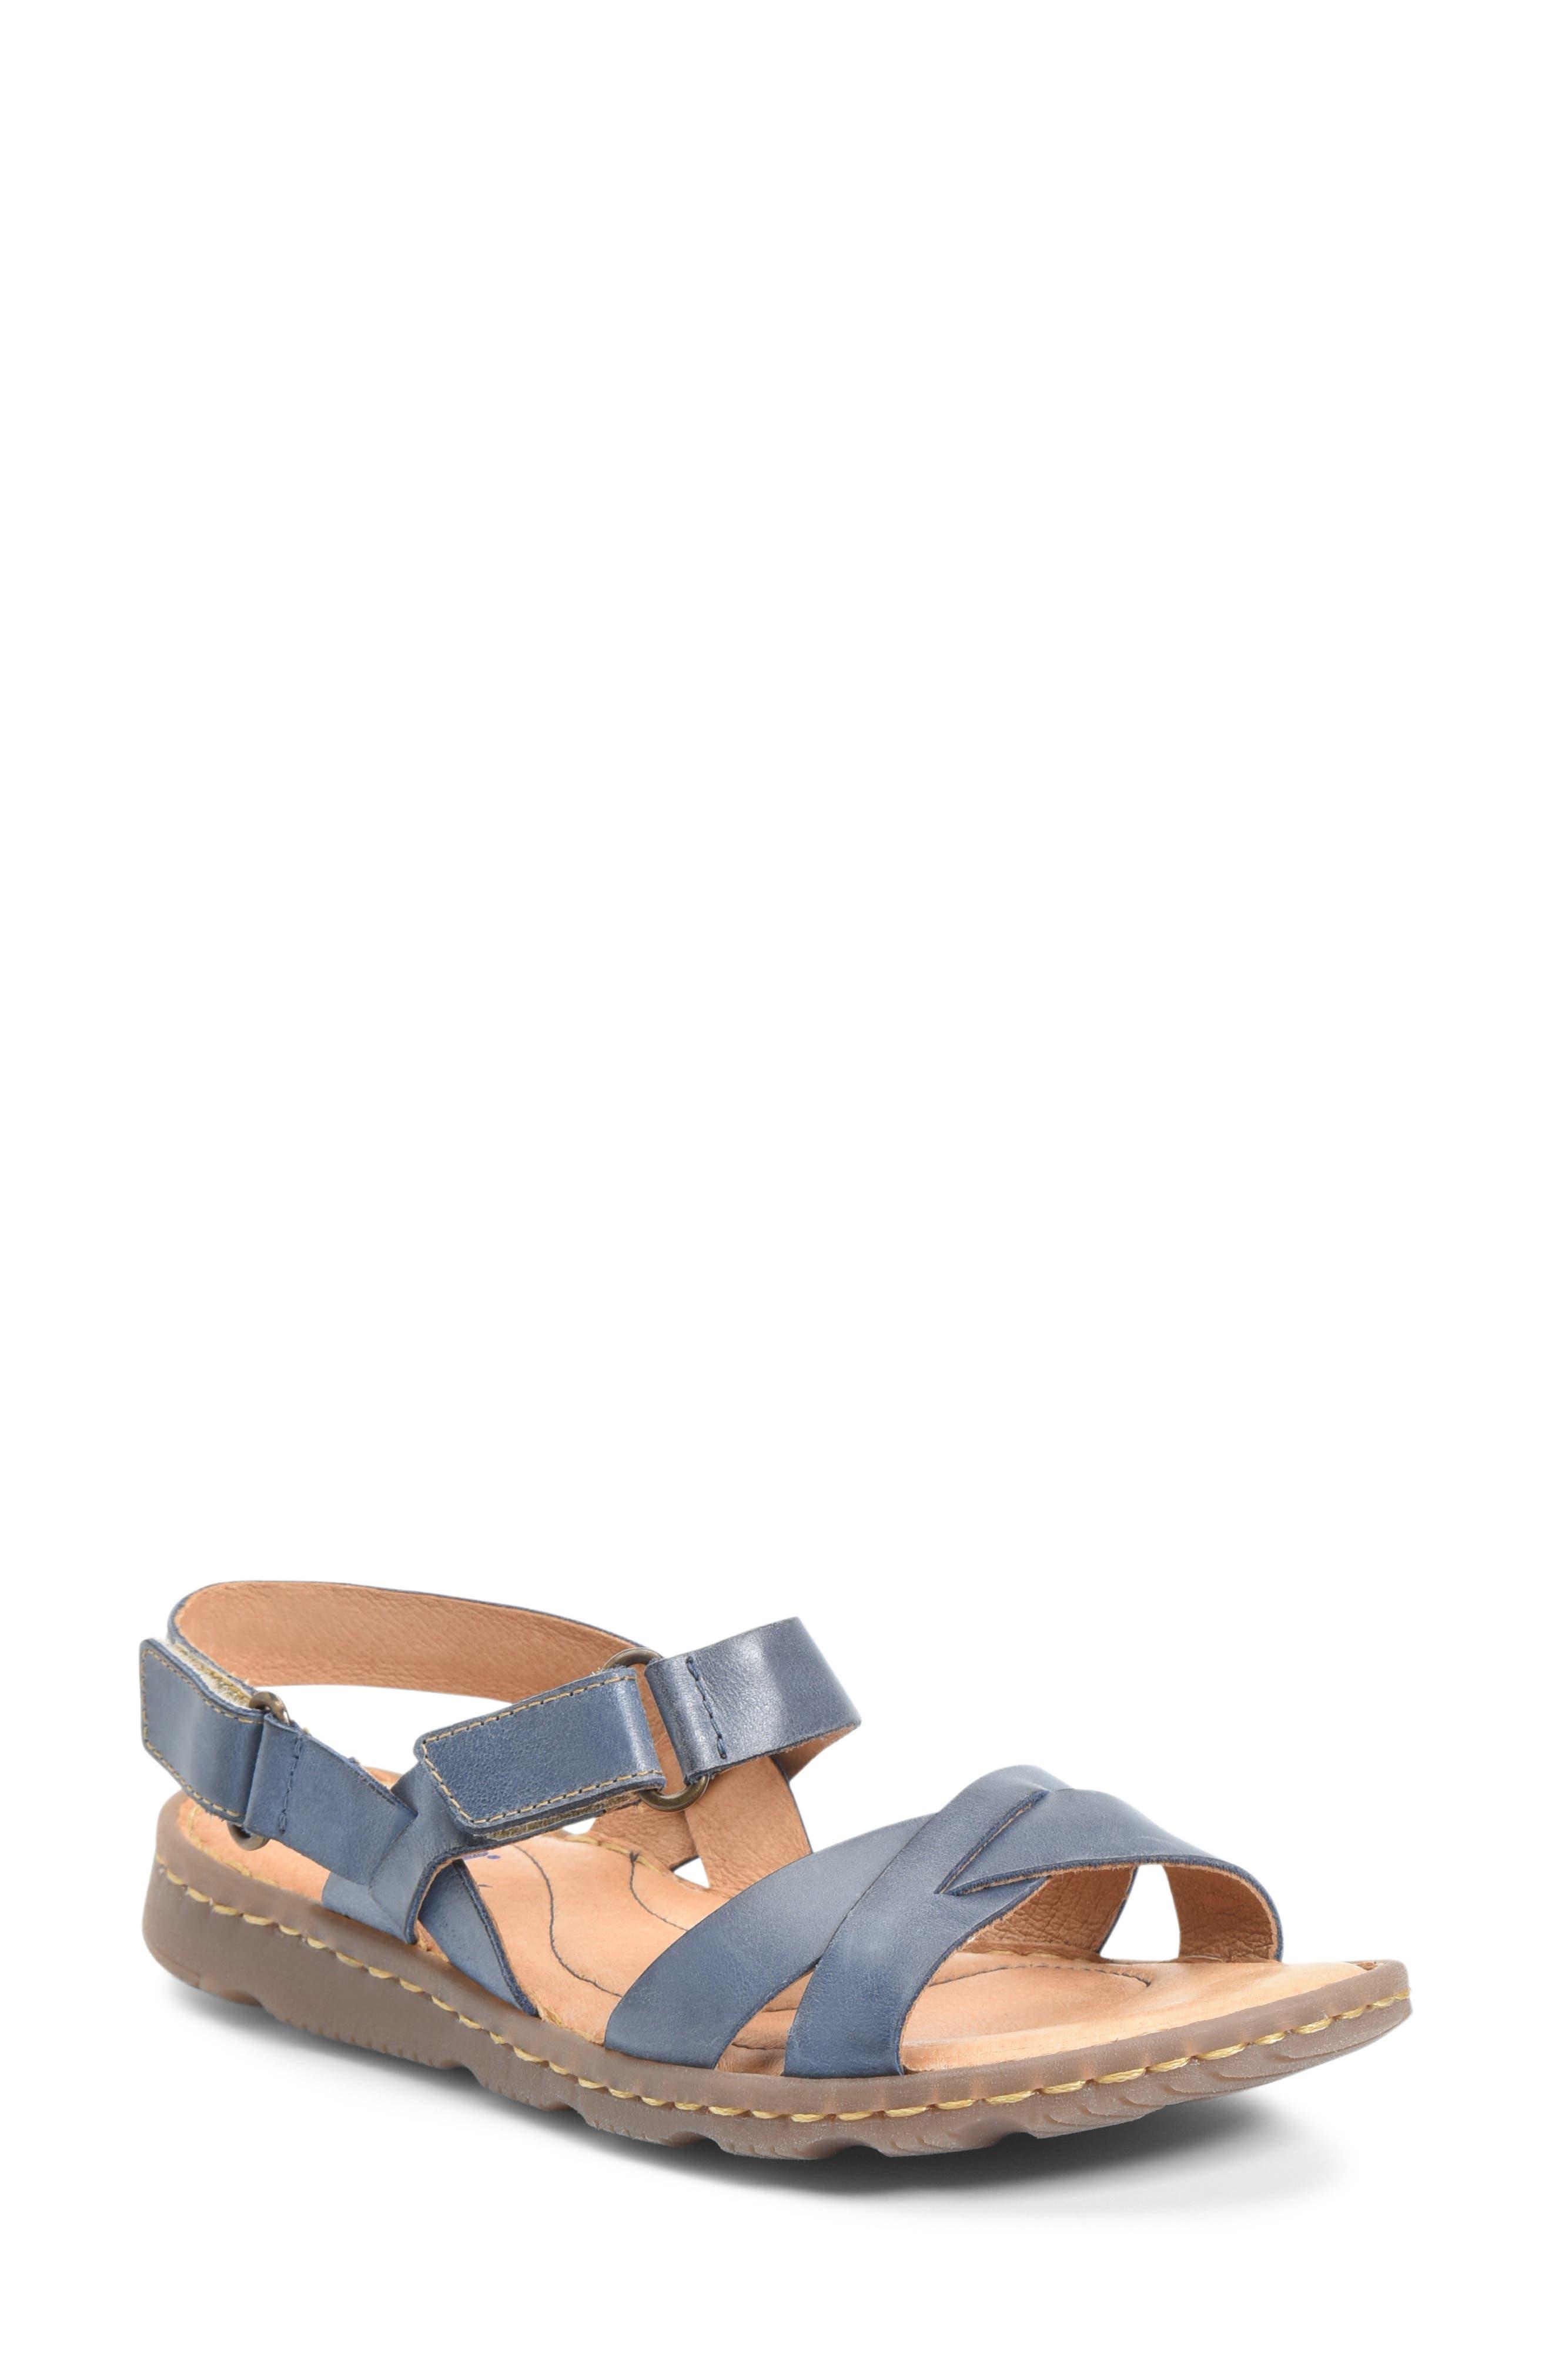 B?rn Jemez Cross Strap Sandal, Blue